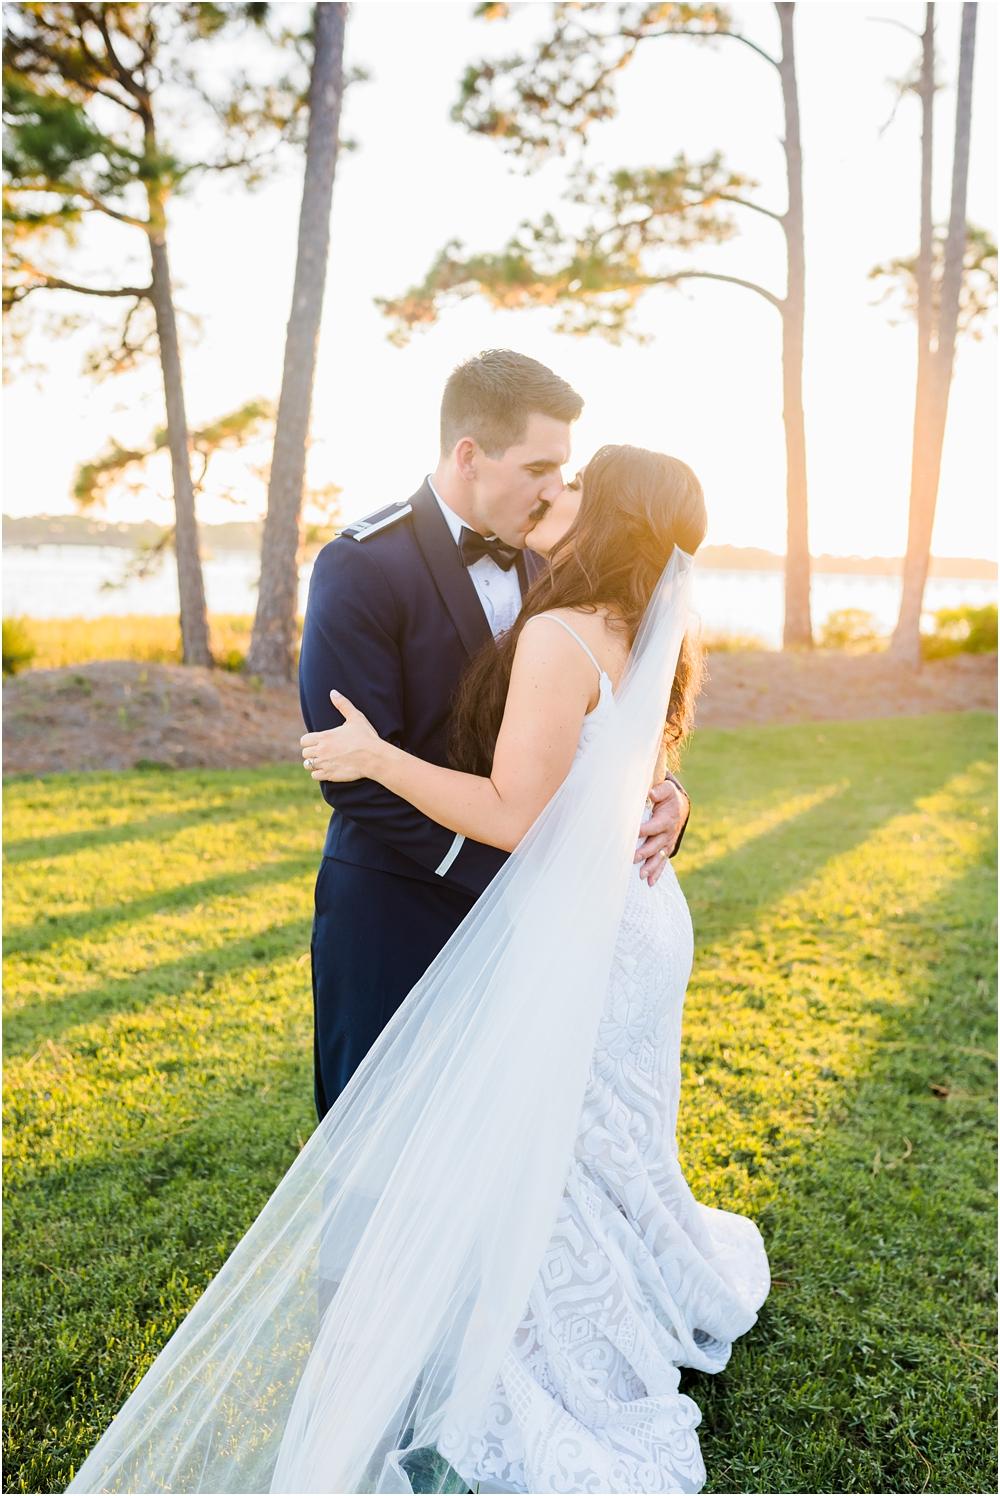 amack-wedding-kiersten-stevenson-photography-30a-panama-city-beach-dothan-tallahassee-(515-of-882).JPG